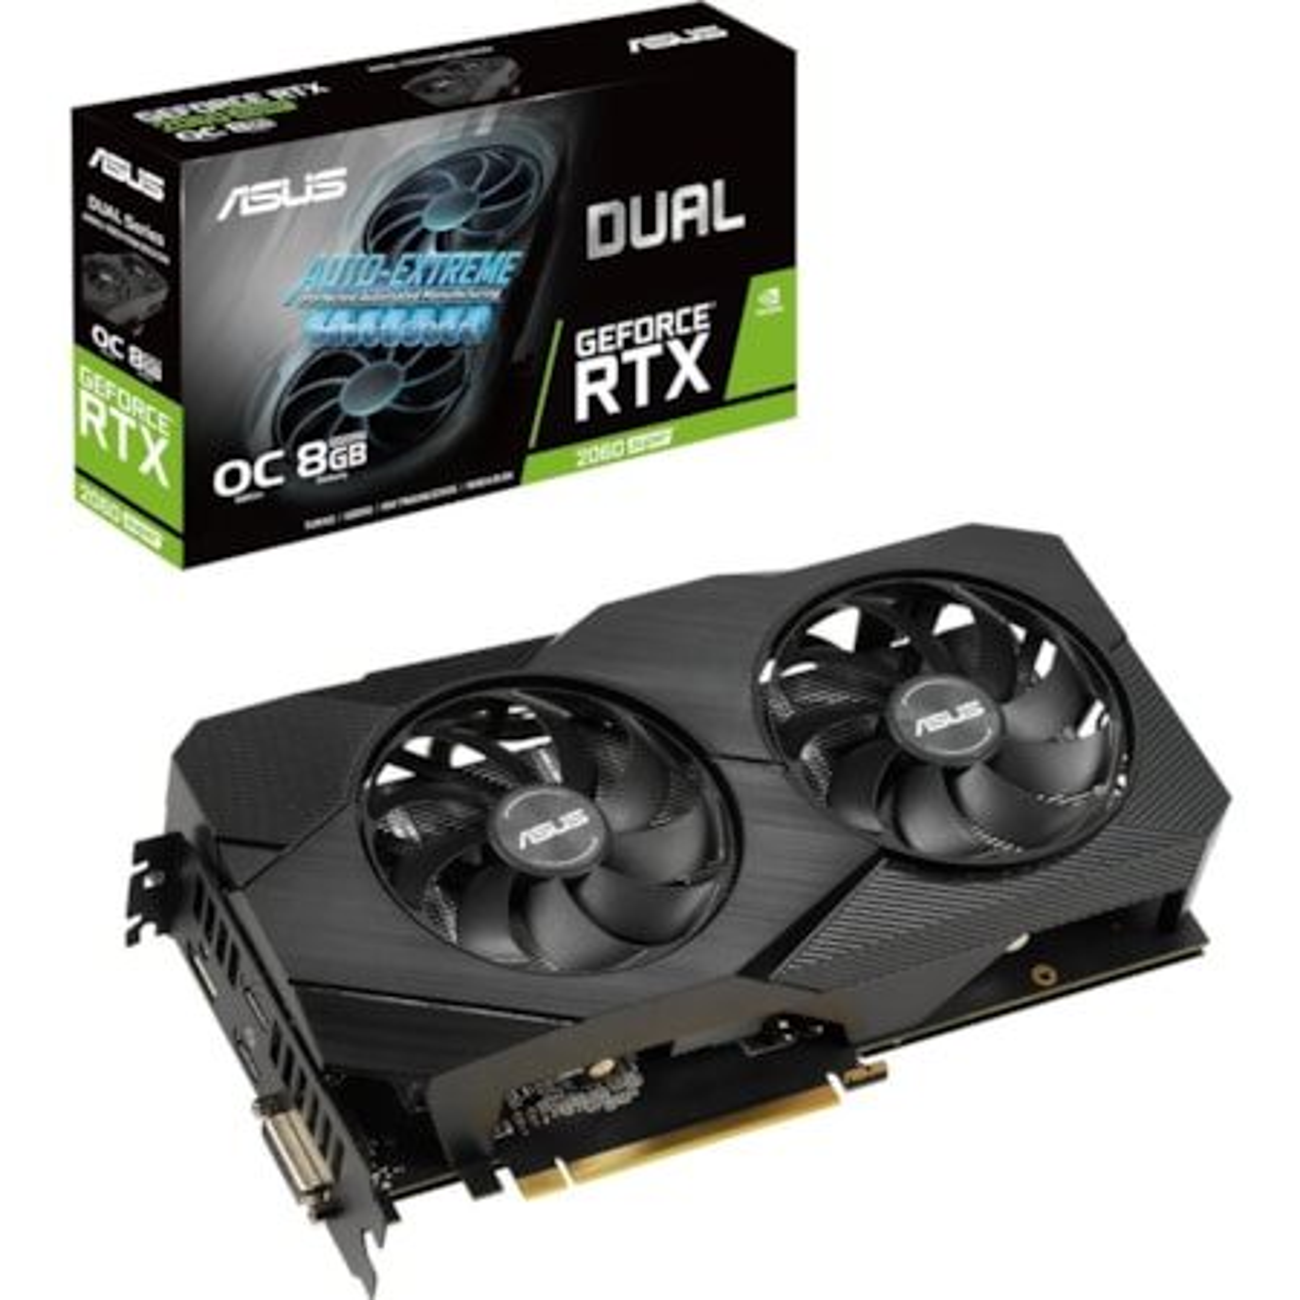 Asus Dual DUAL-RTX2060S-O8G-EVO-V2 GeForce RTX 2060 SUPER Graphic Card - 8 GB GDDR6